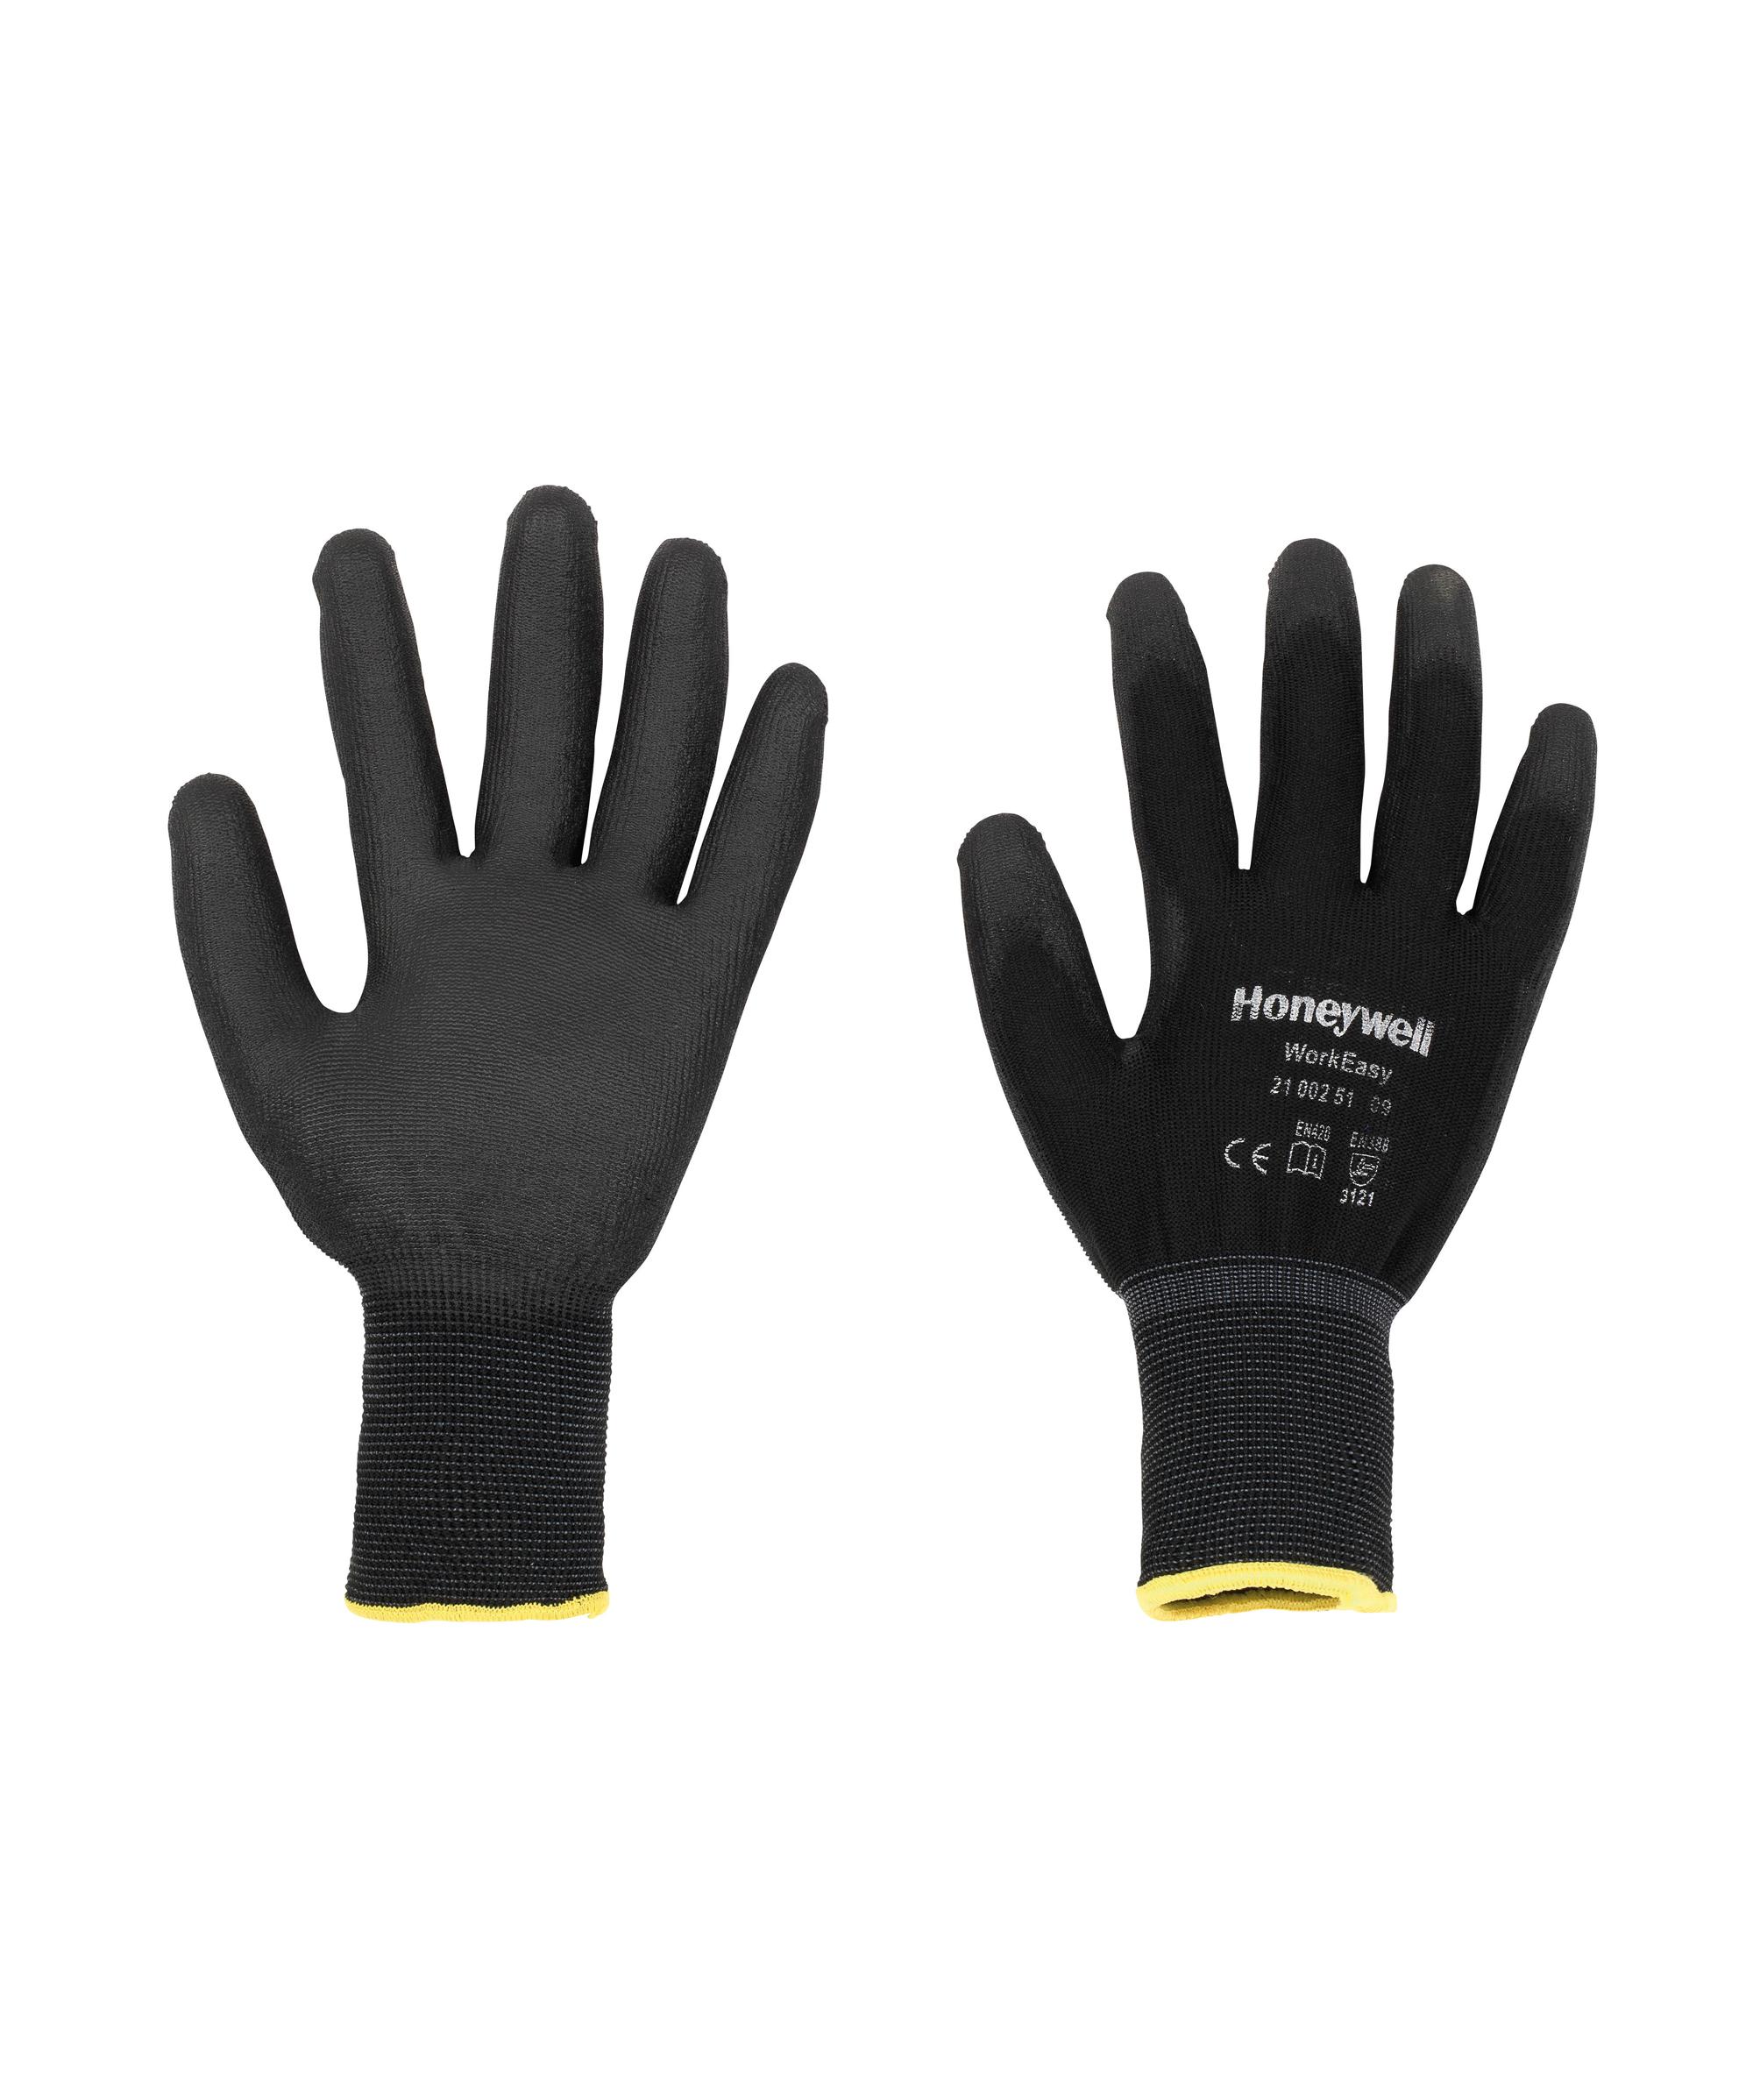 10 Pairs Honeywell PU Coated Black Precision Work Gloves Size 11 XXL 2100251